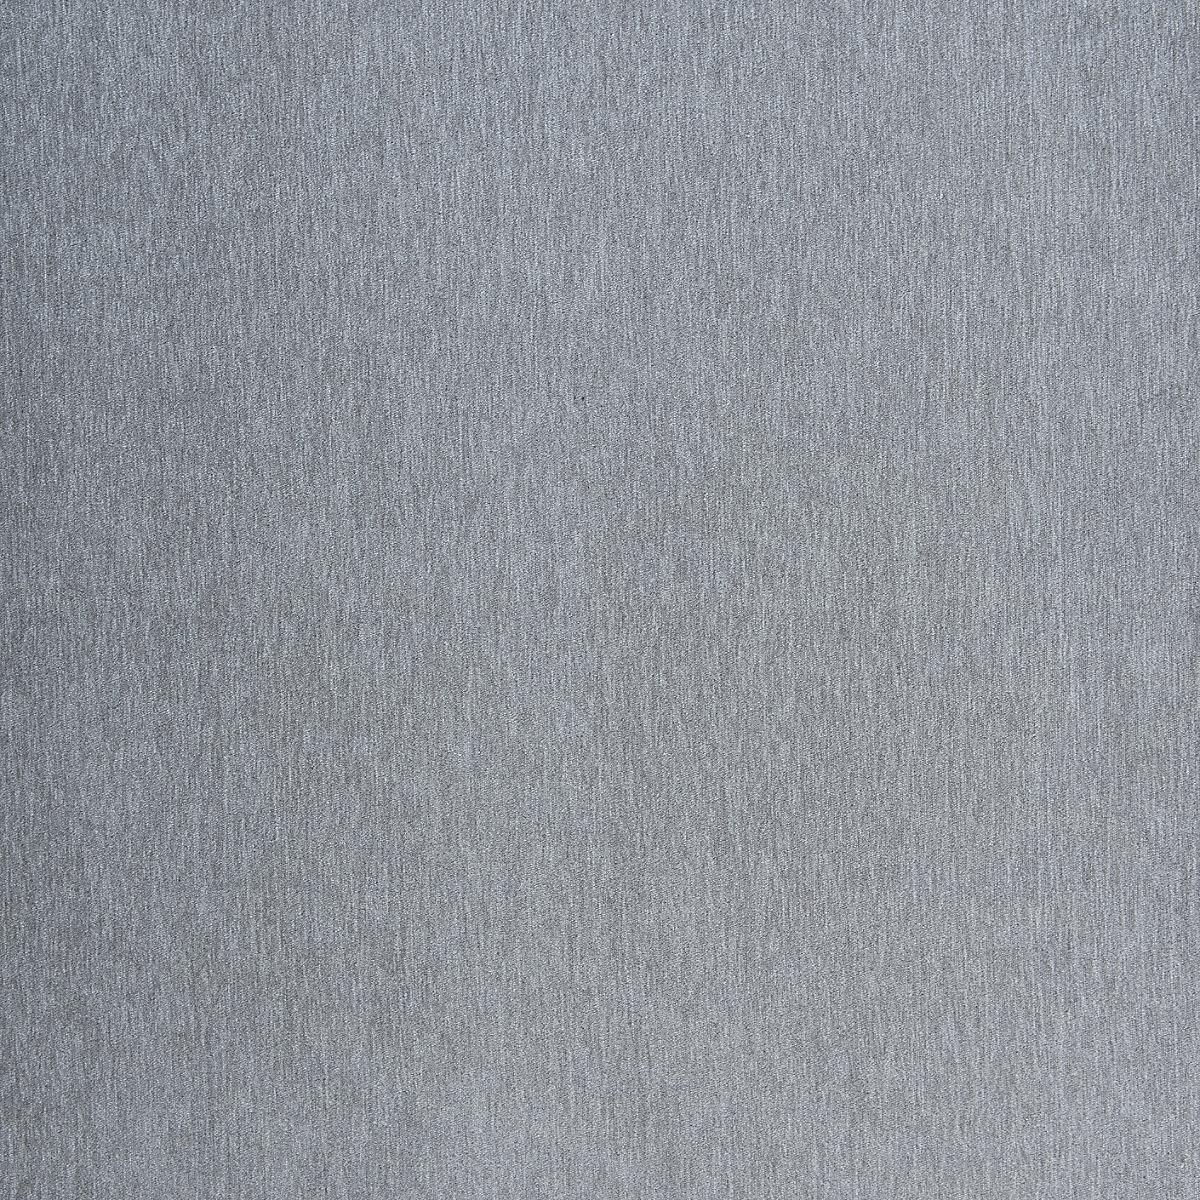 Serenity: Slate (fabric yardage)